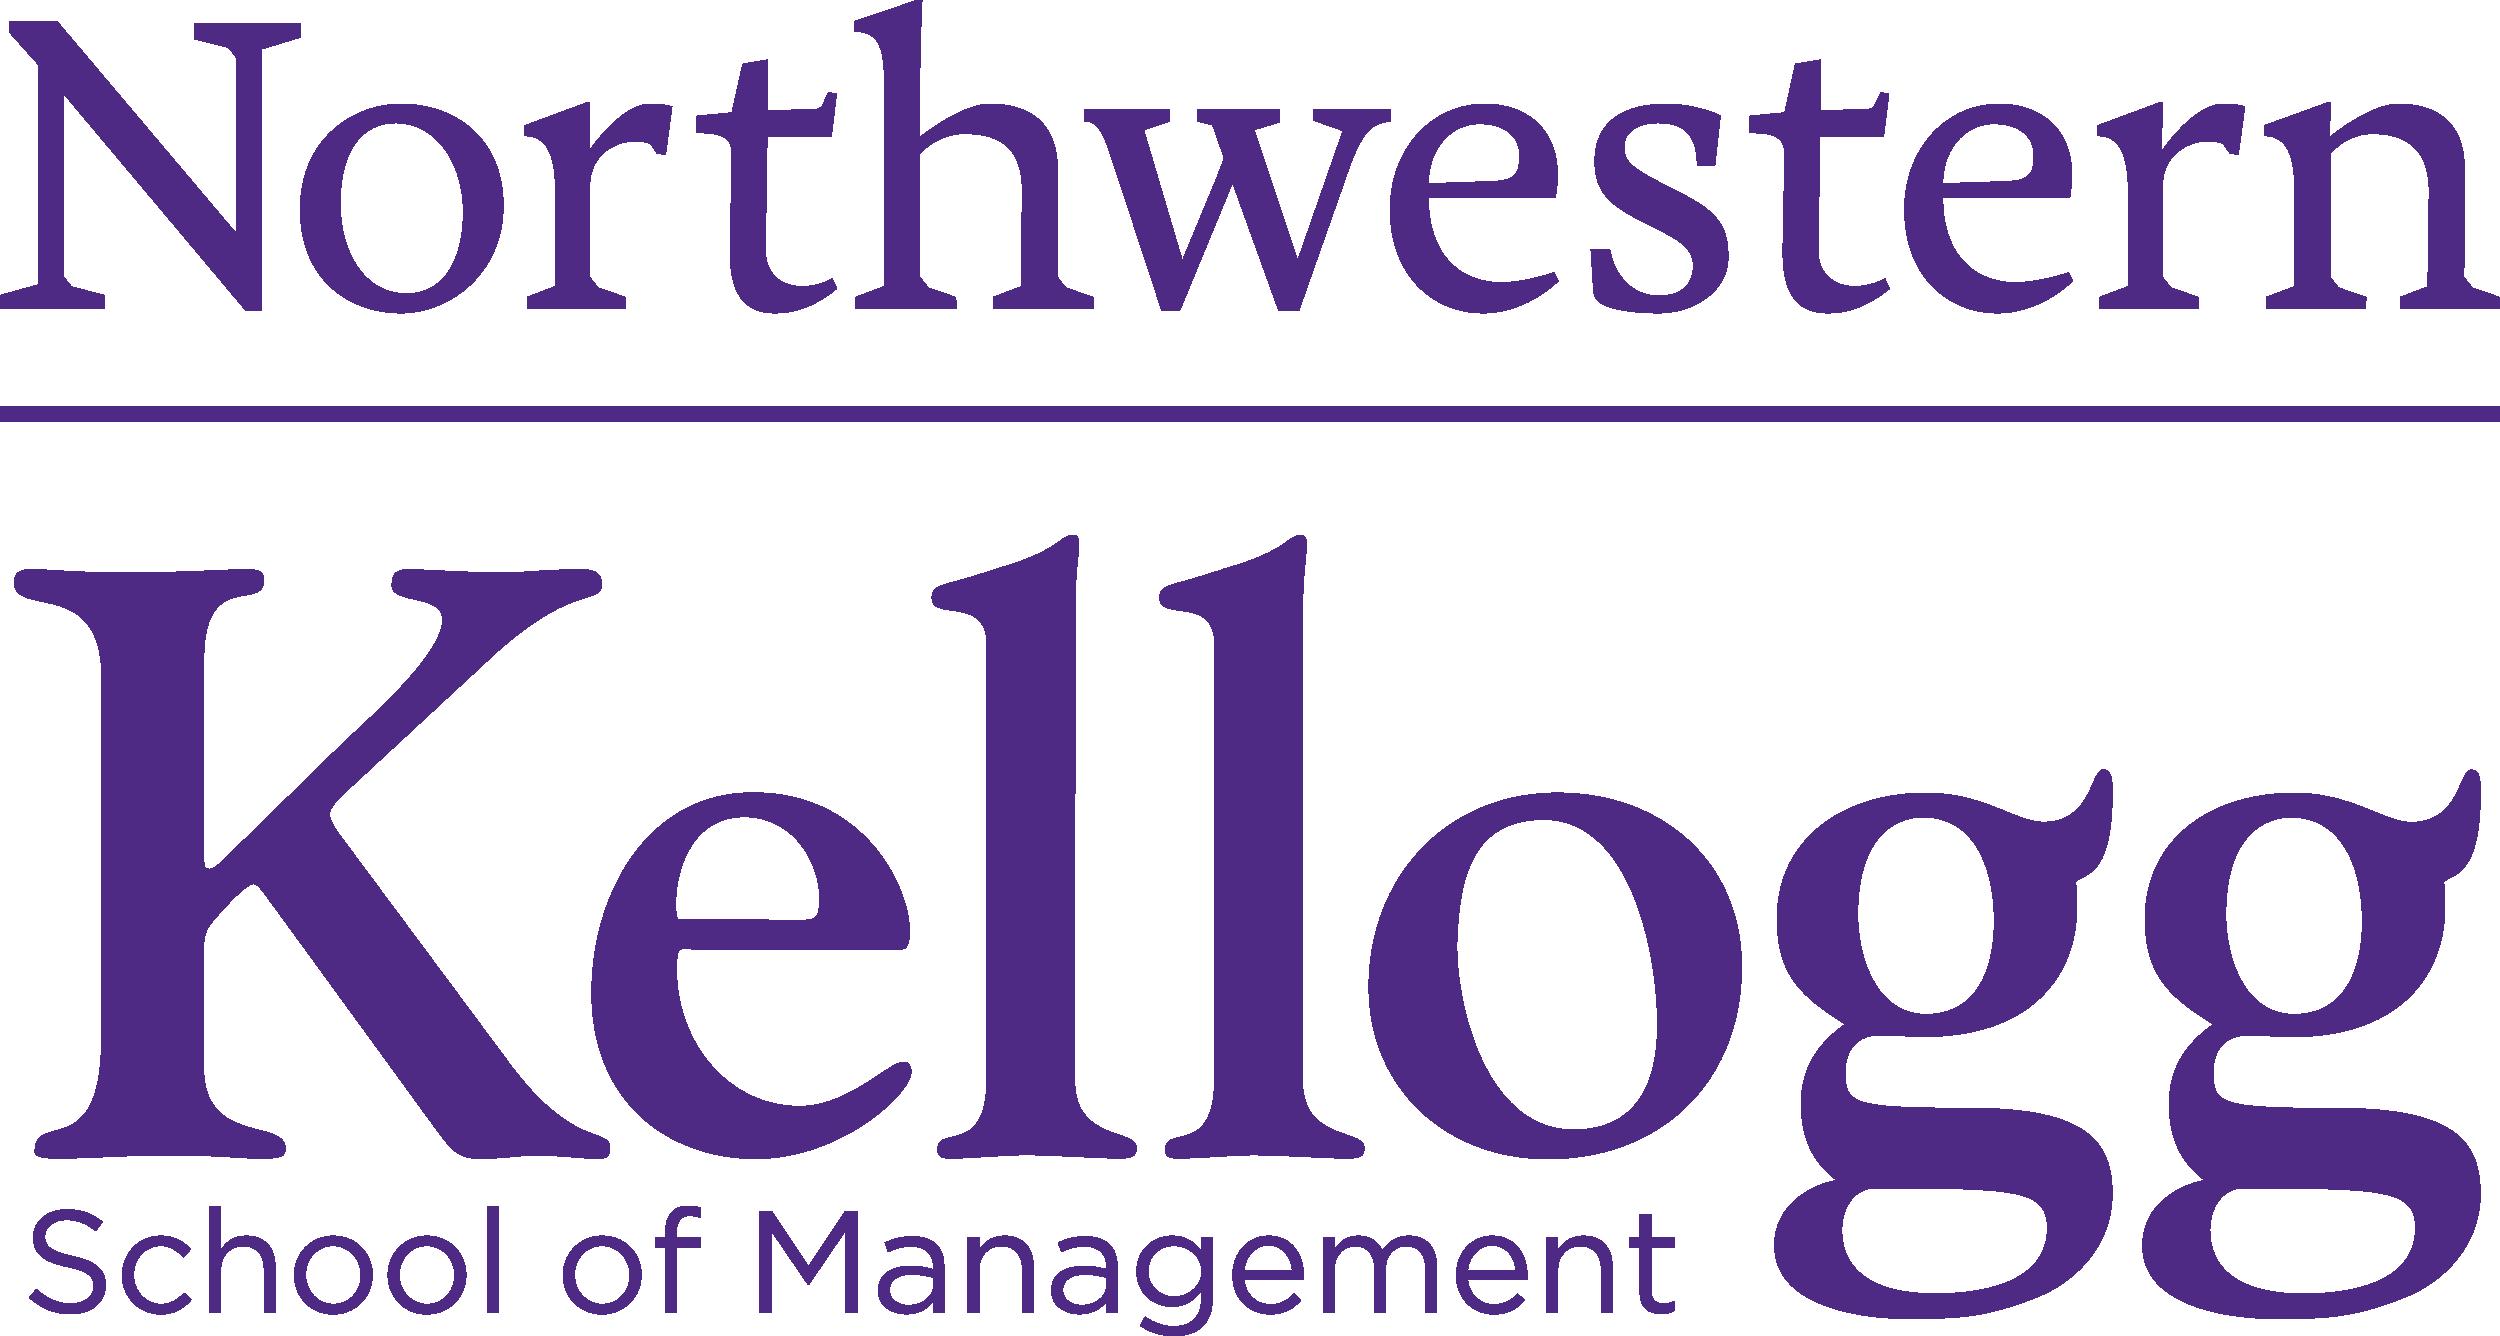 Northwestern University's Kellogg School of Management Executive Education